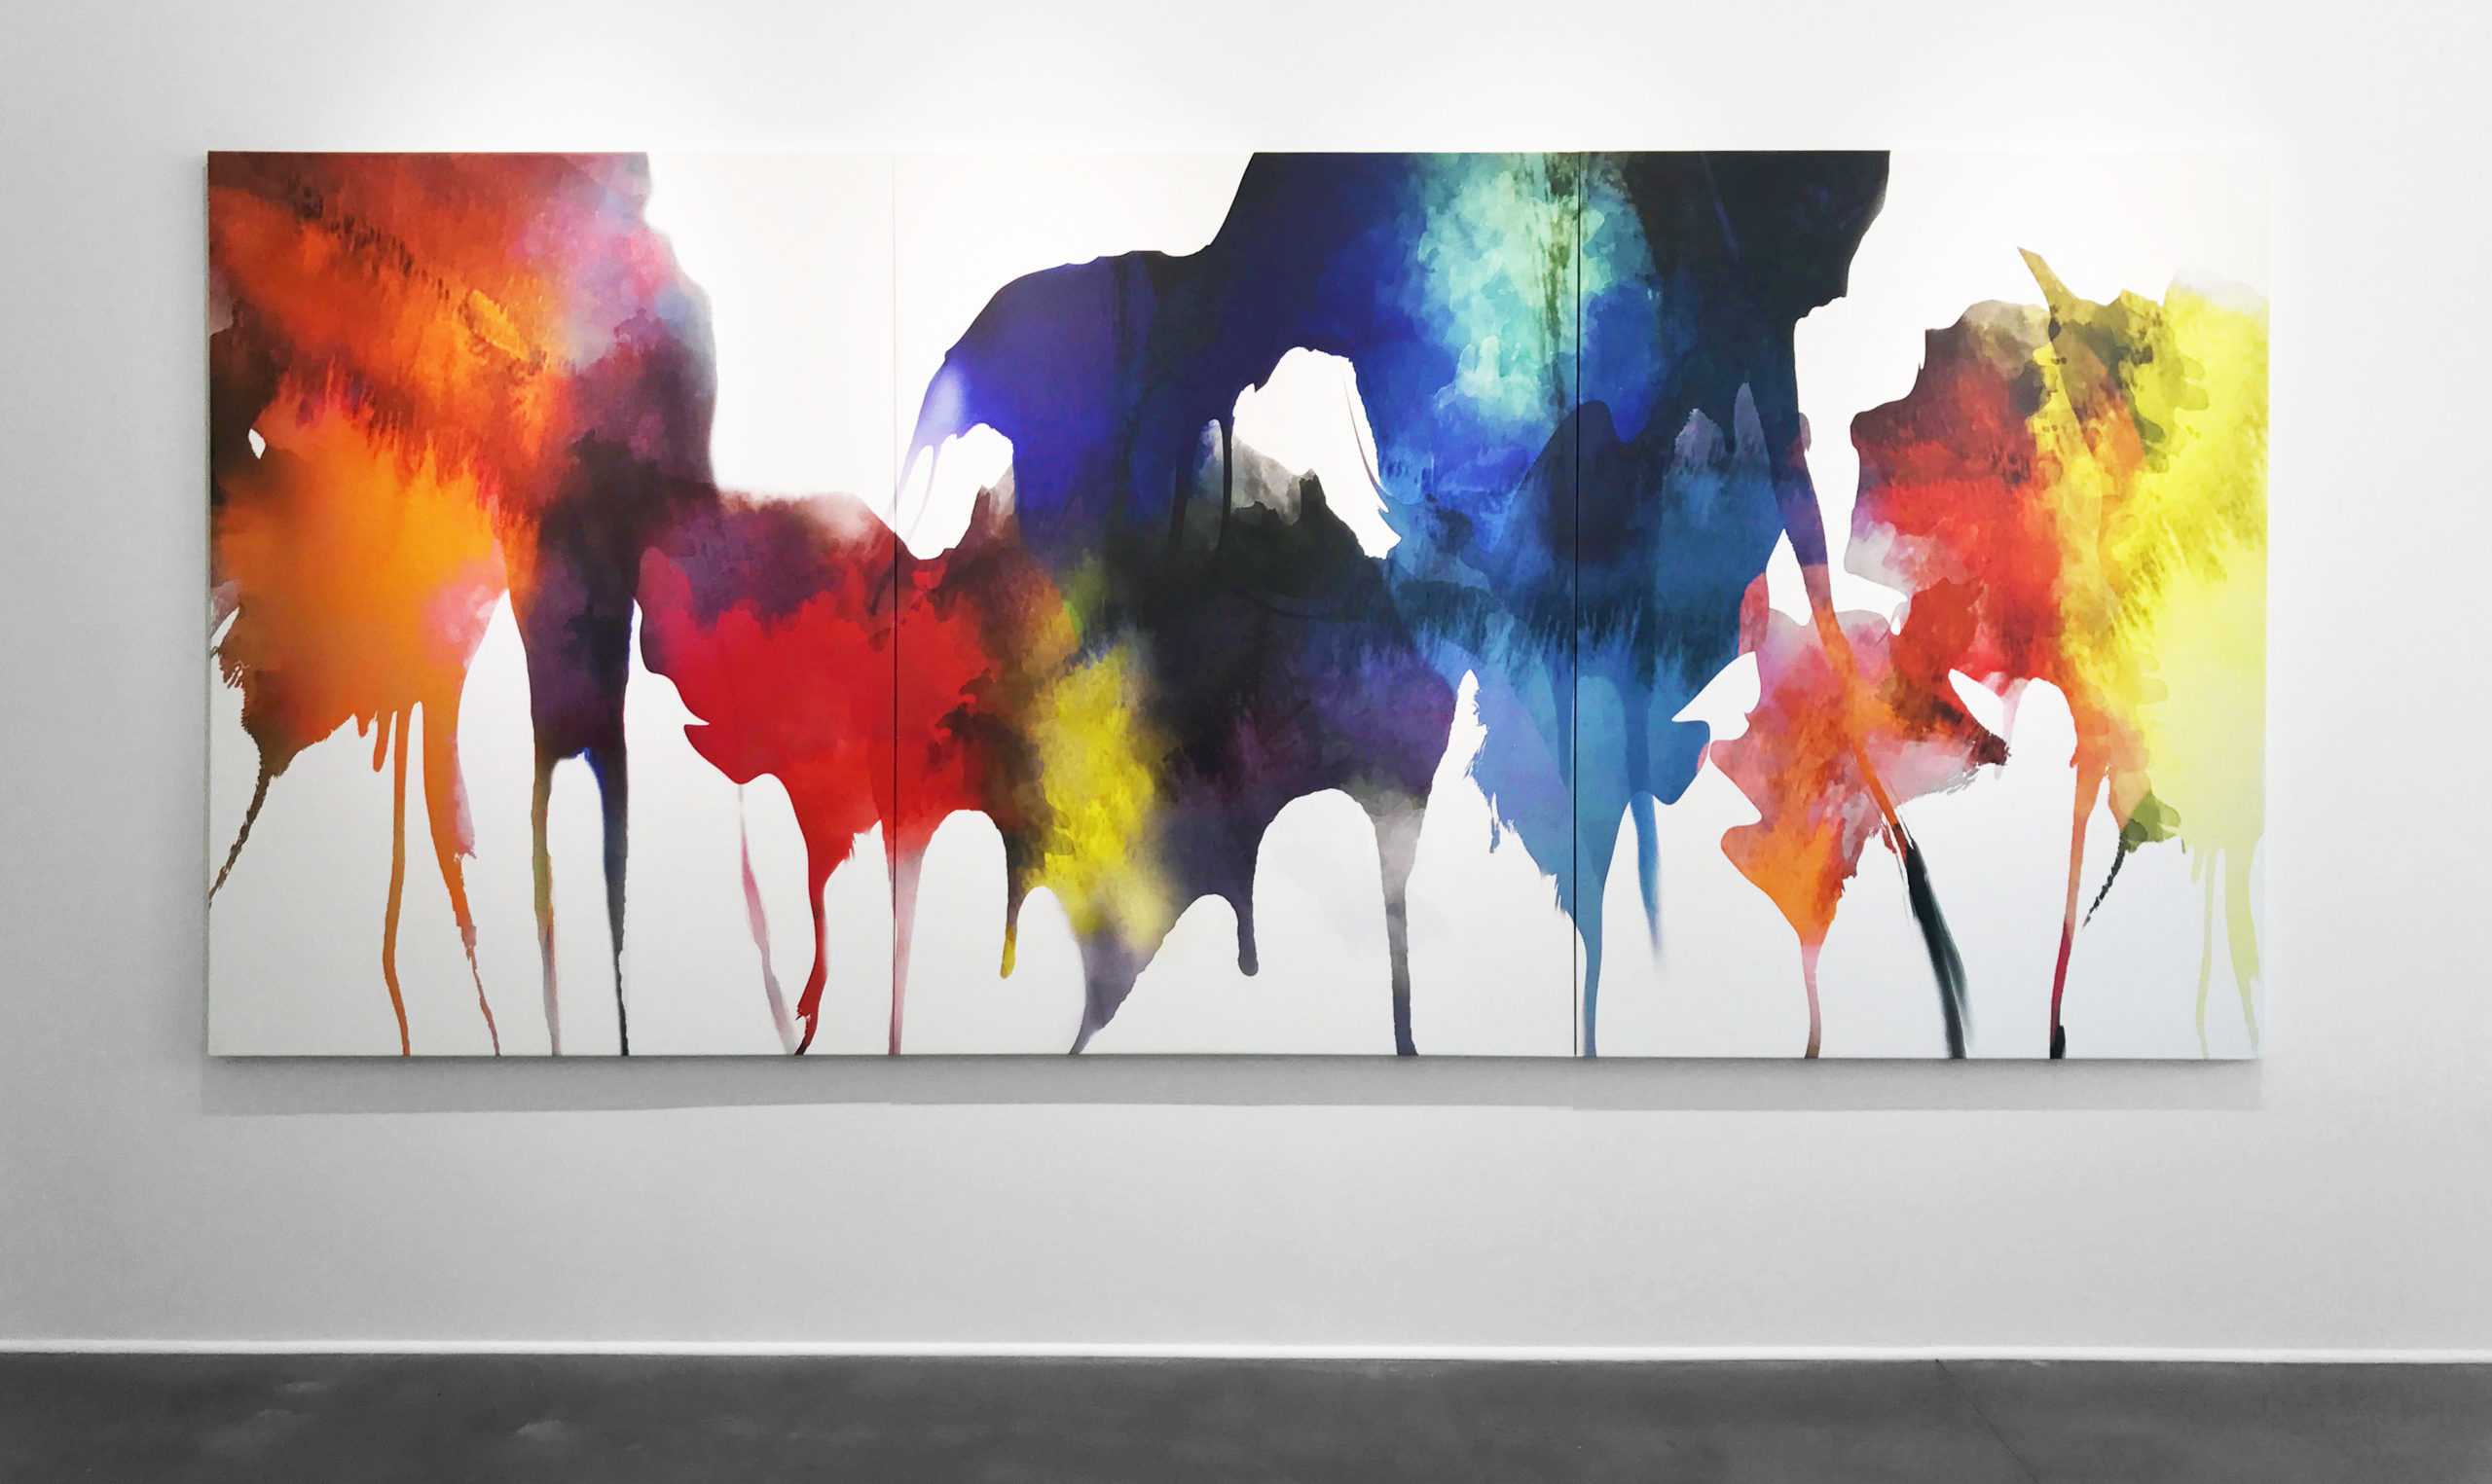 Art Addiction Image 1